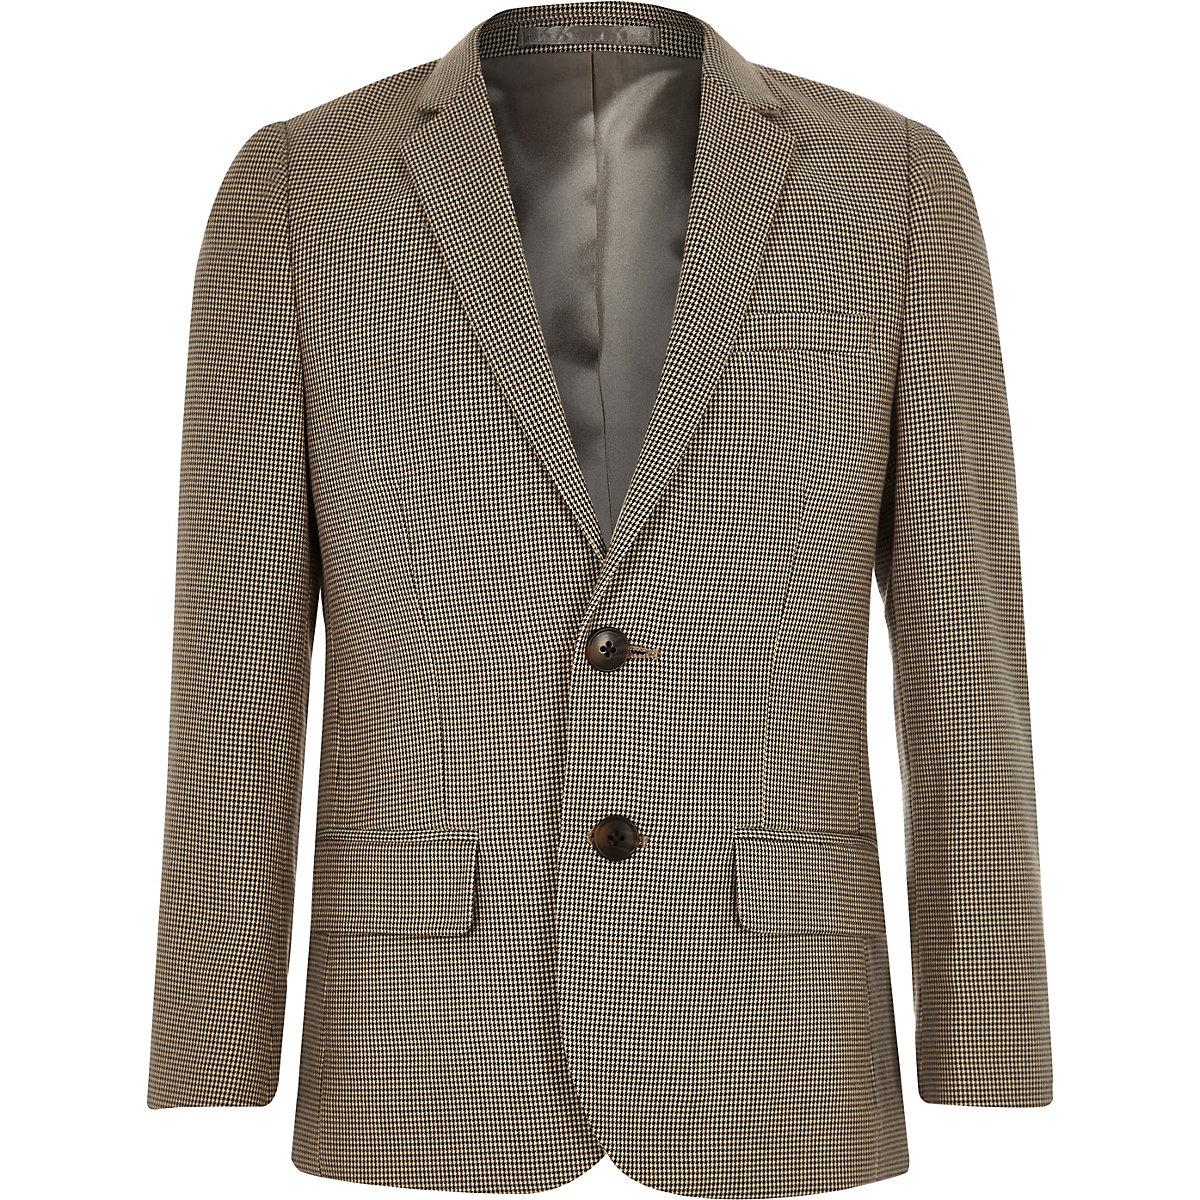 Boys brown check suit blazer